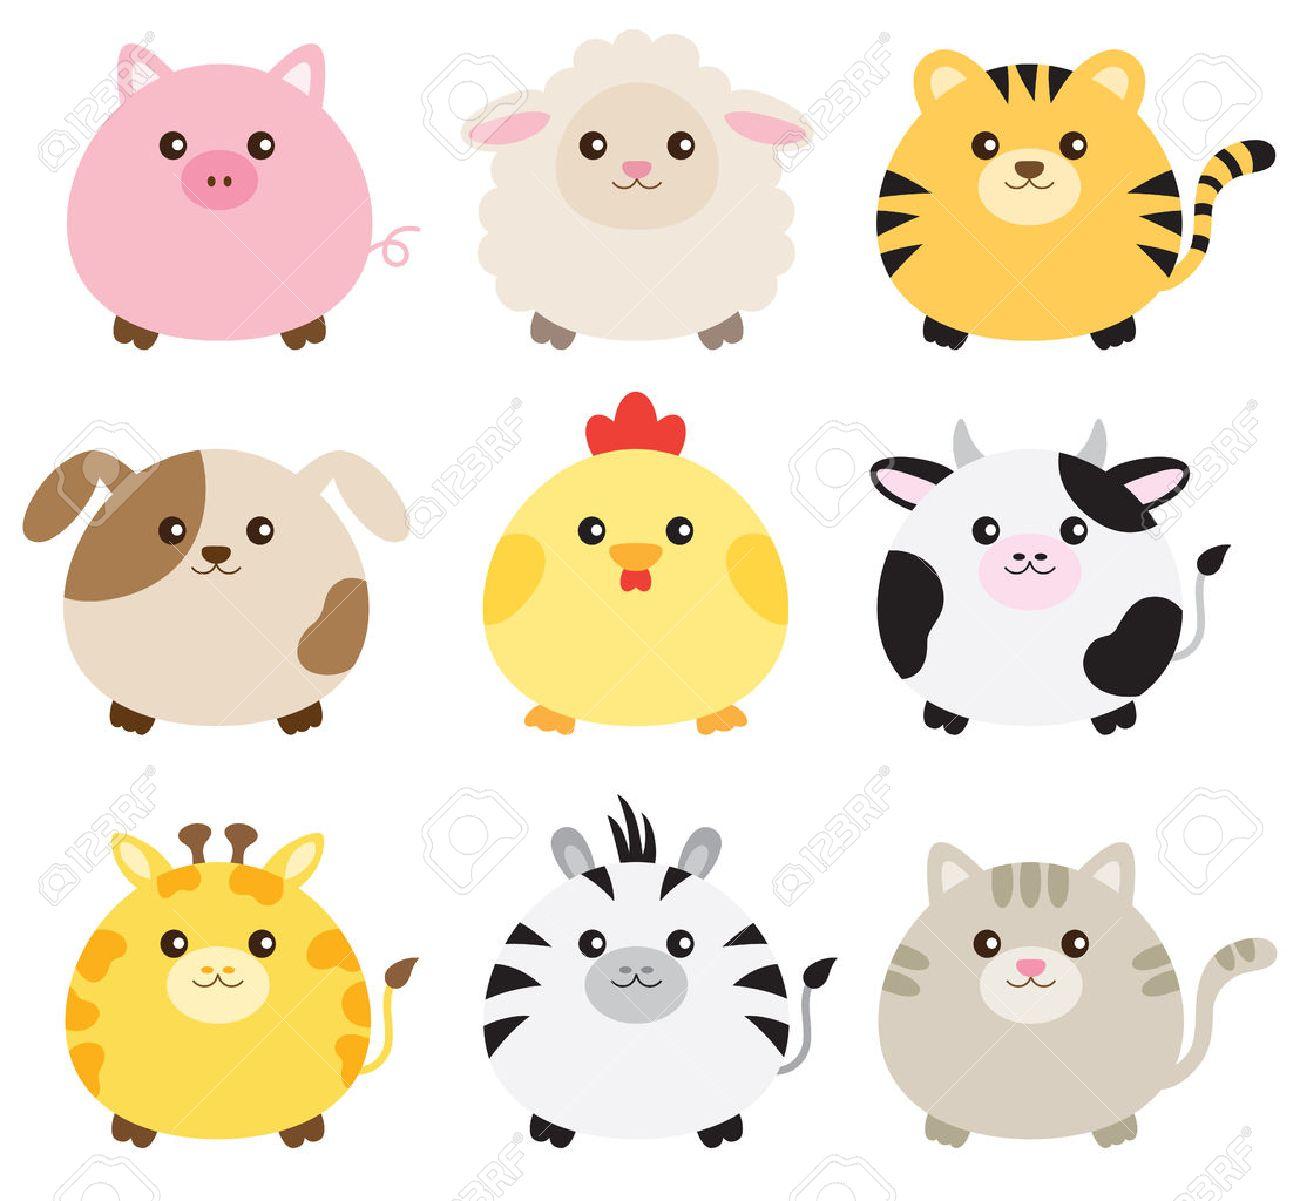 illustration of  animals including pig, sheep, tiger, dog, chicken, cow, giraffe, zebra and cat. Stock Vector - 51331478